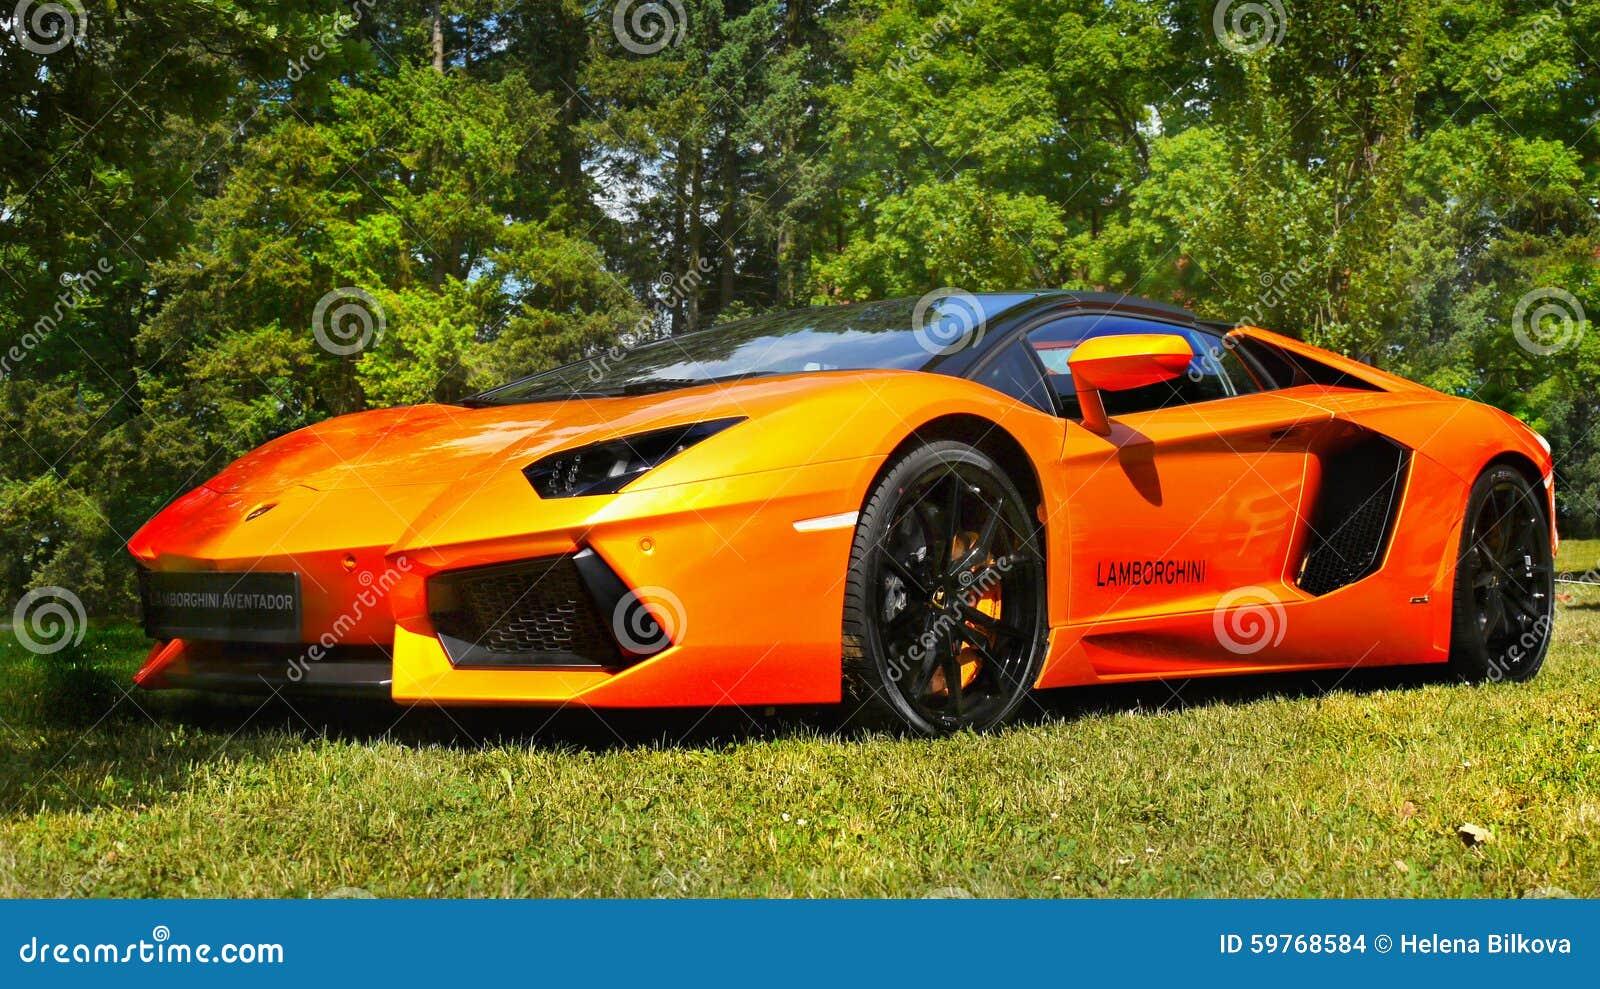 Coches de deportes, Estupendo-coches, Lamborghini Aventador